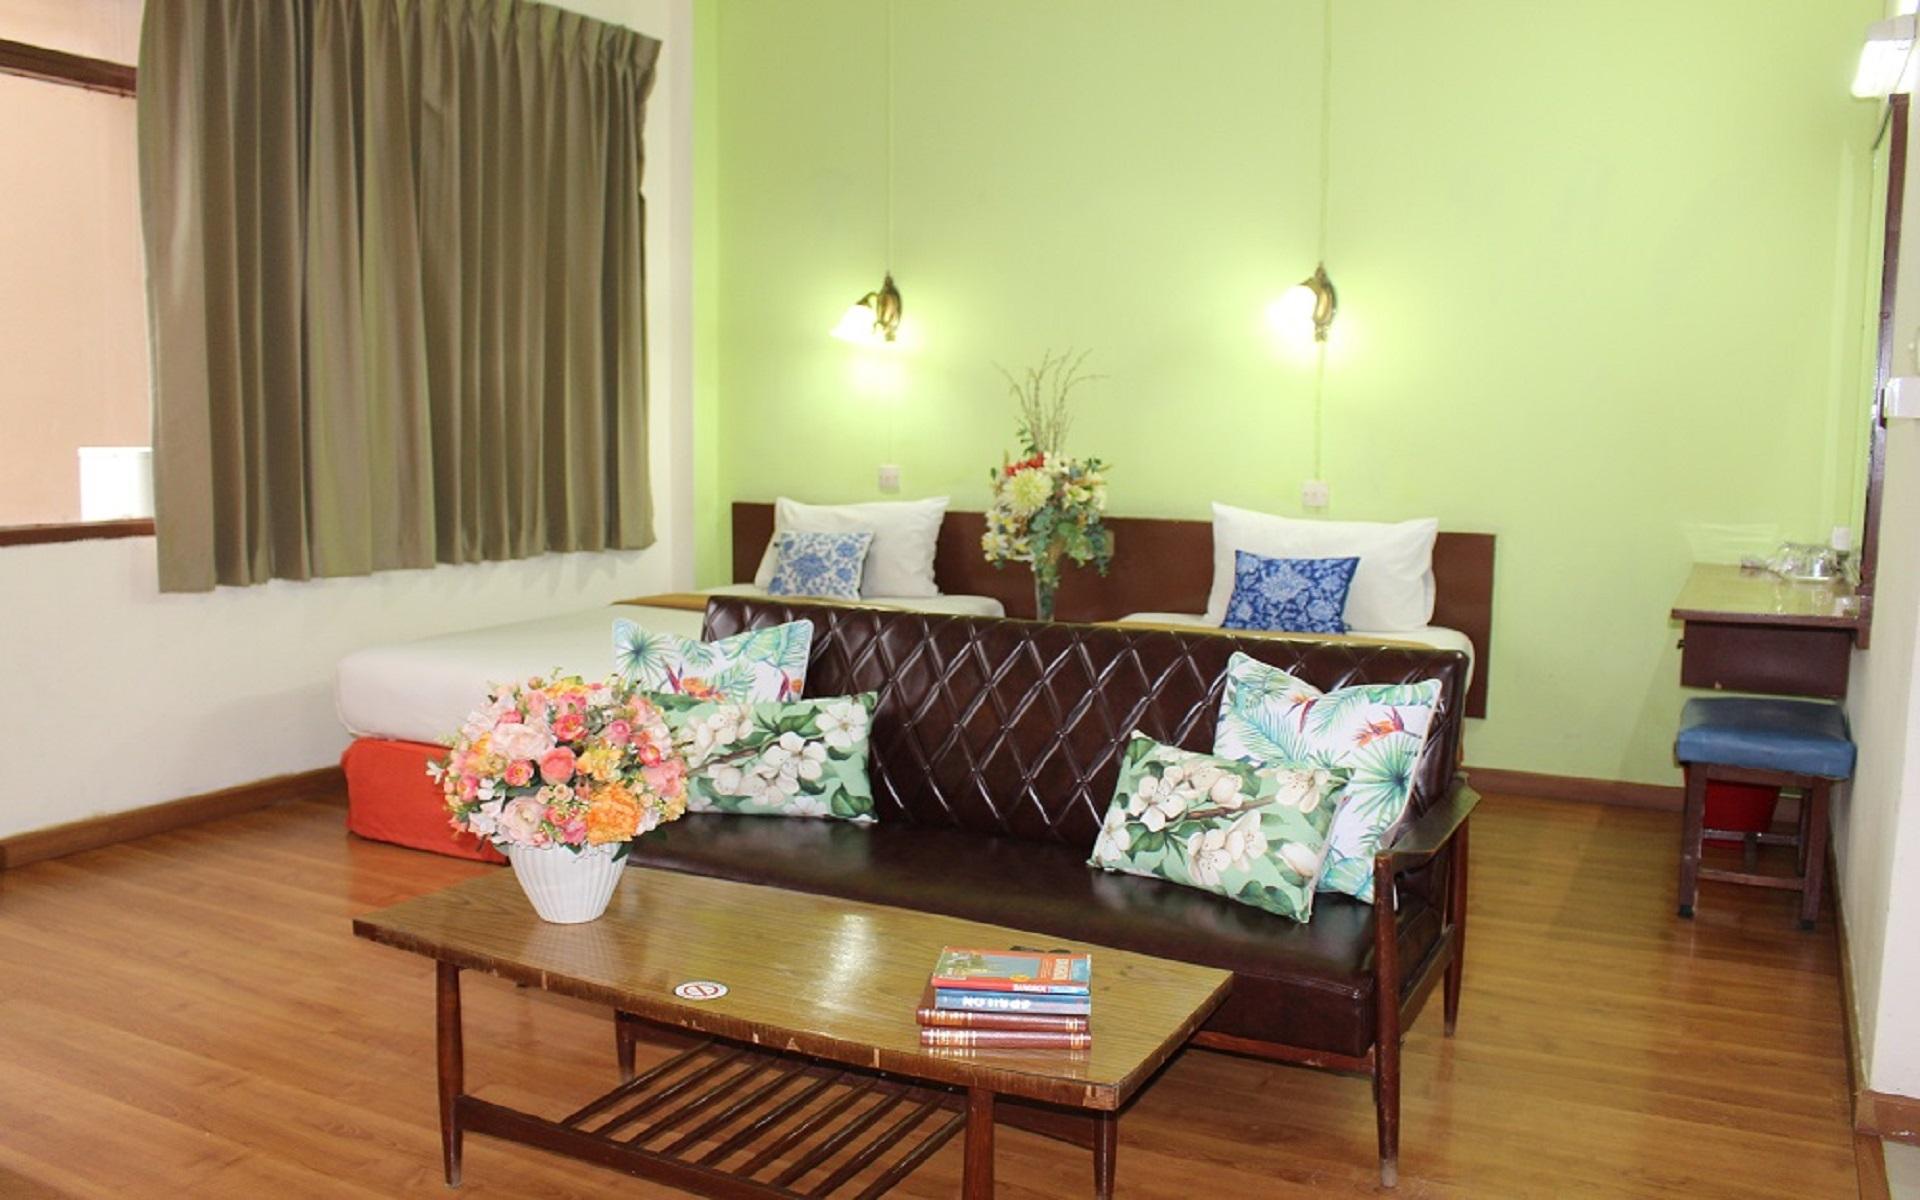 HOTEL - The Miami Hotel Sukhumvit Soi 13